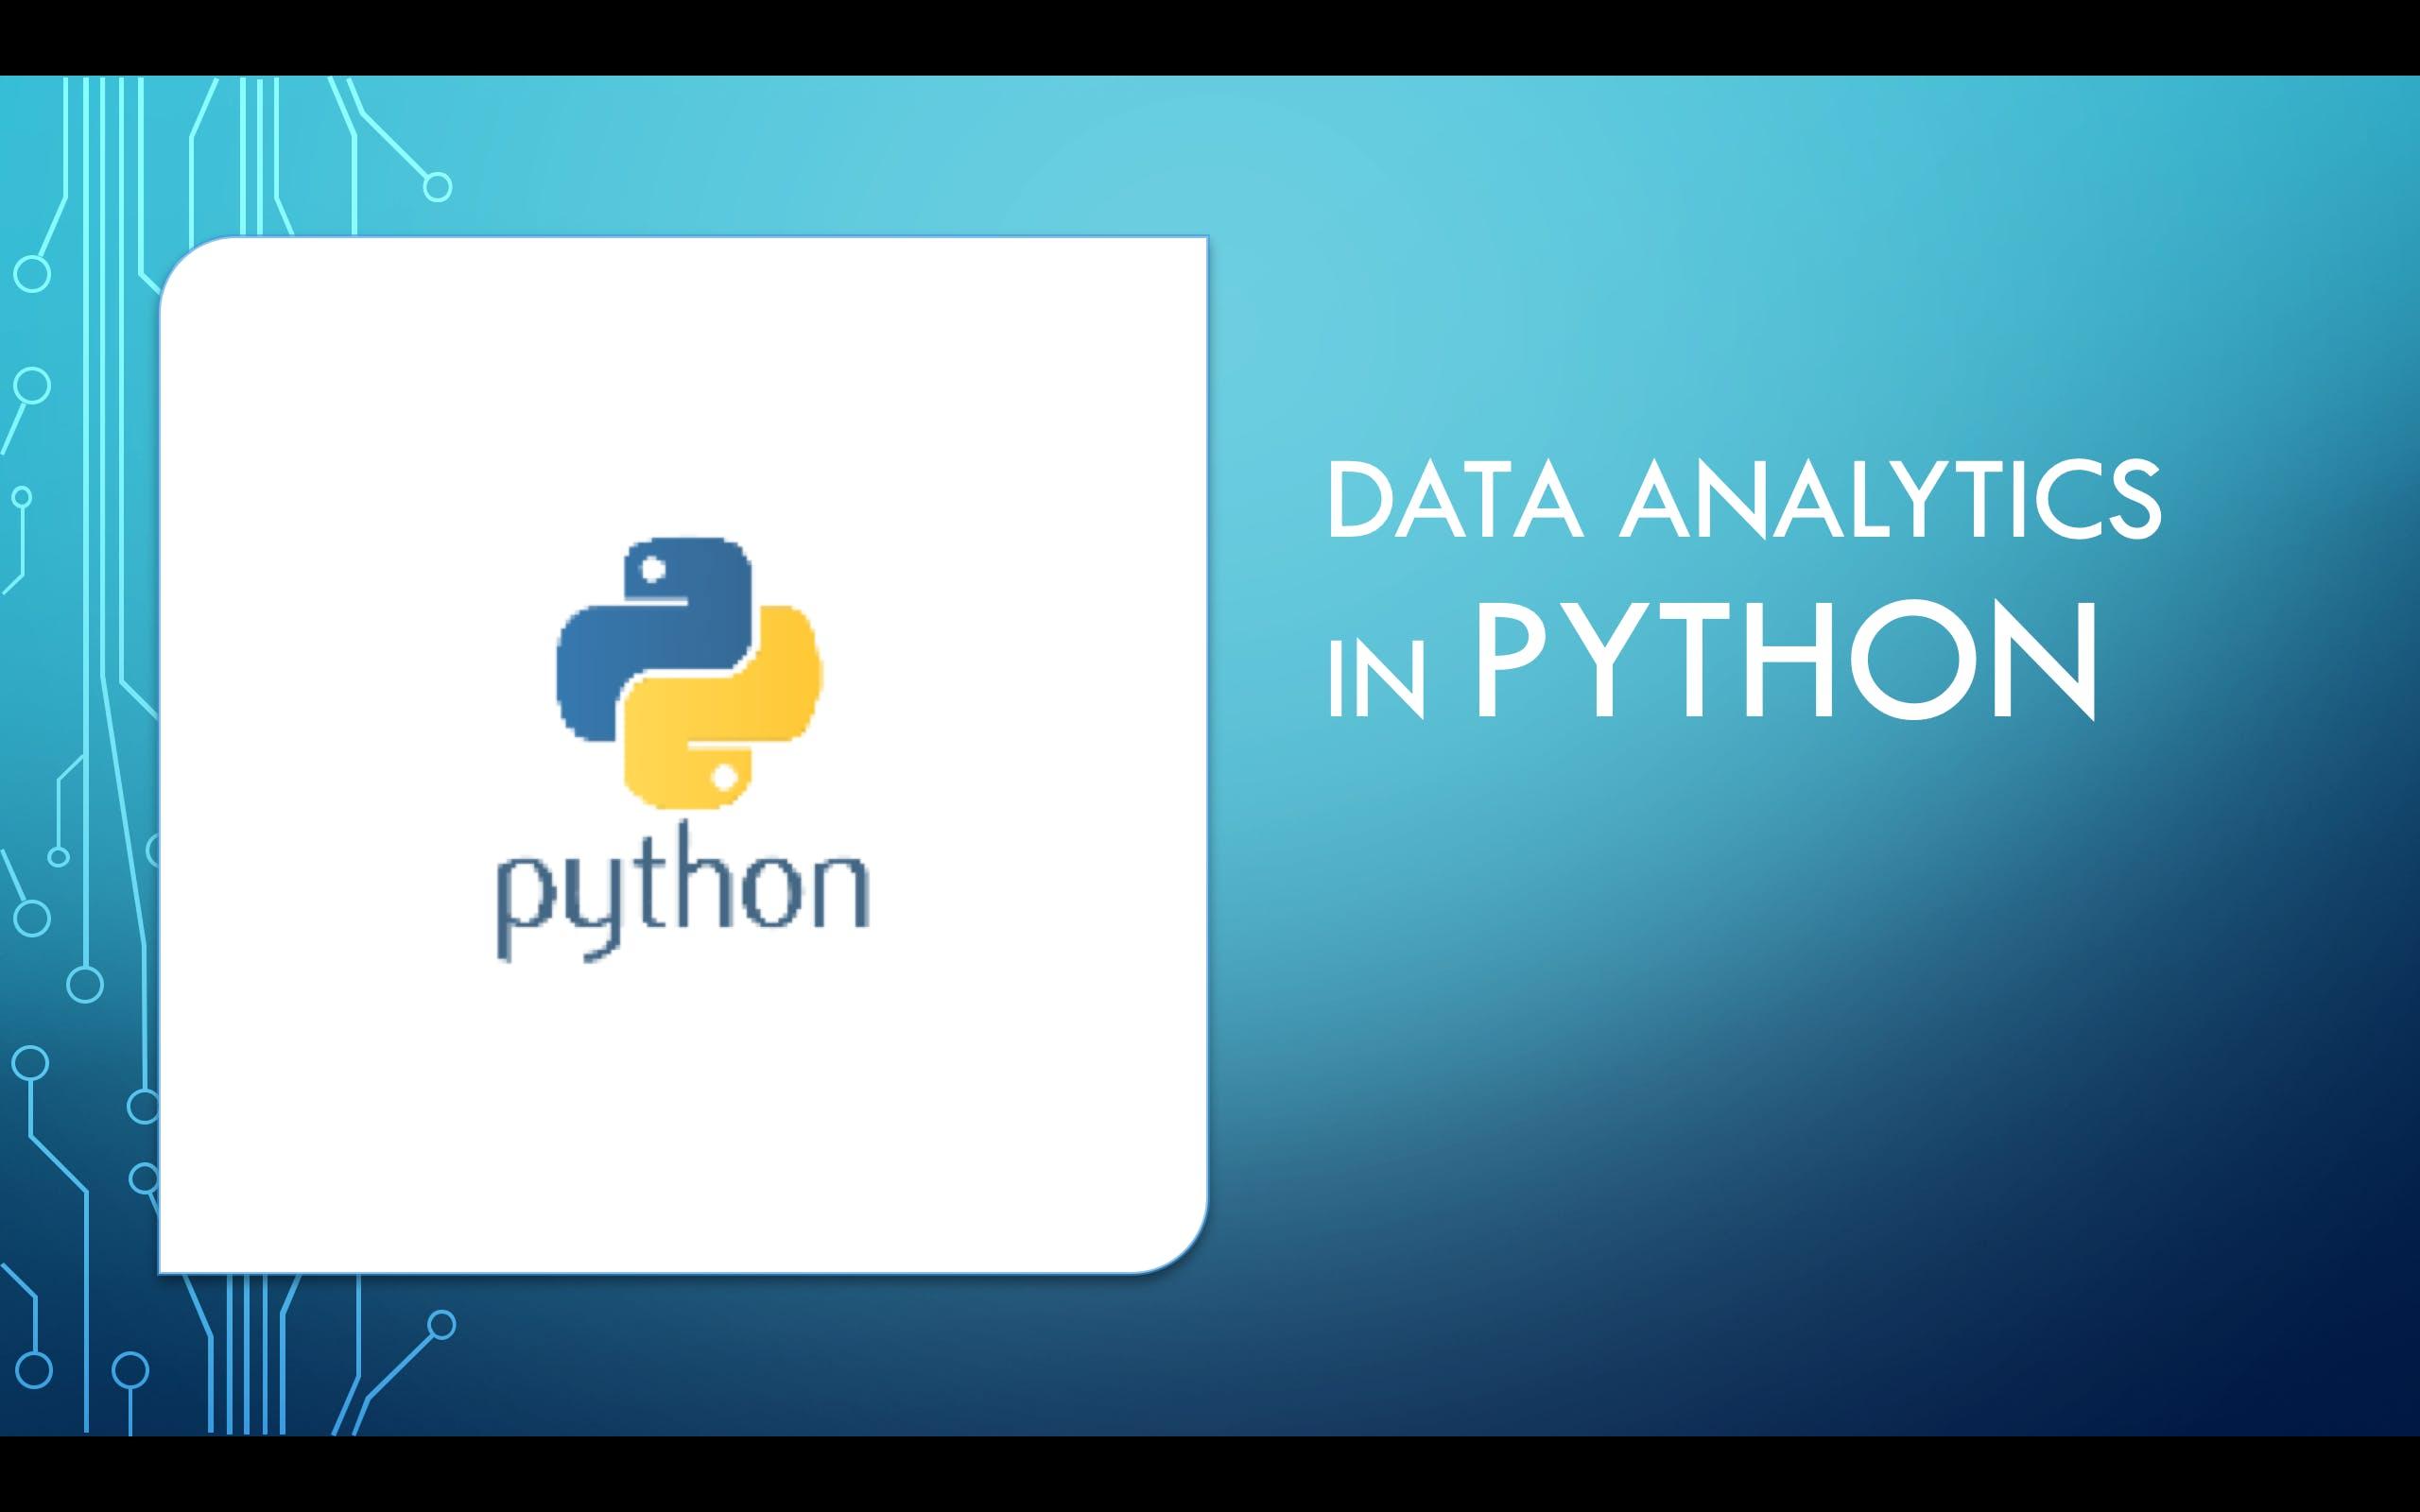 Data Analytics in Python Training : Scipy, Numpy, Pandas, Matplotlib ( 4 Hours Live Online)-Barcelona, Spain